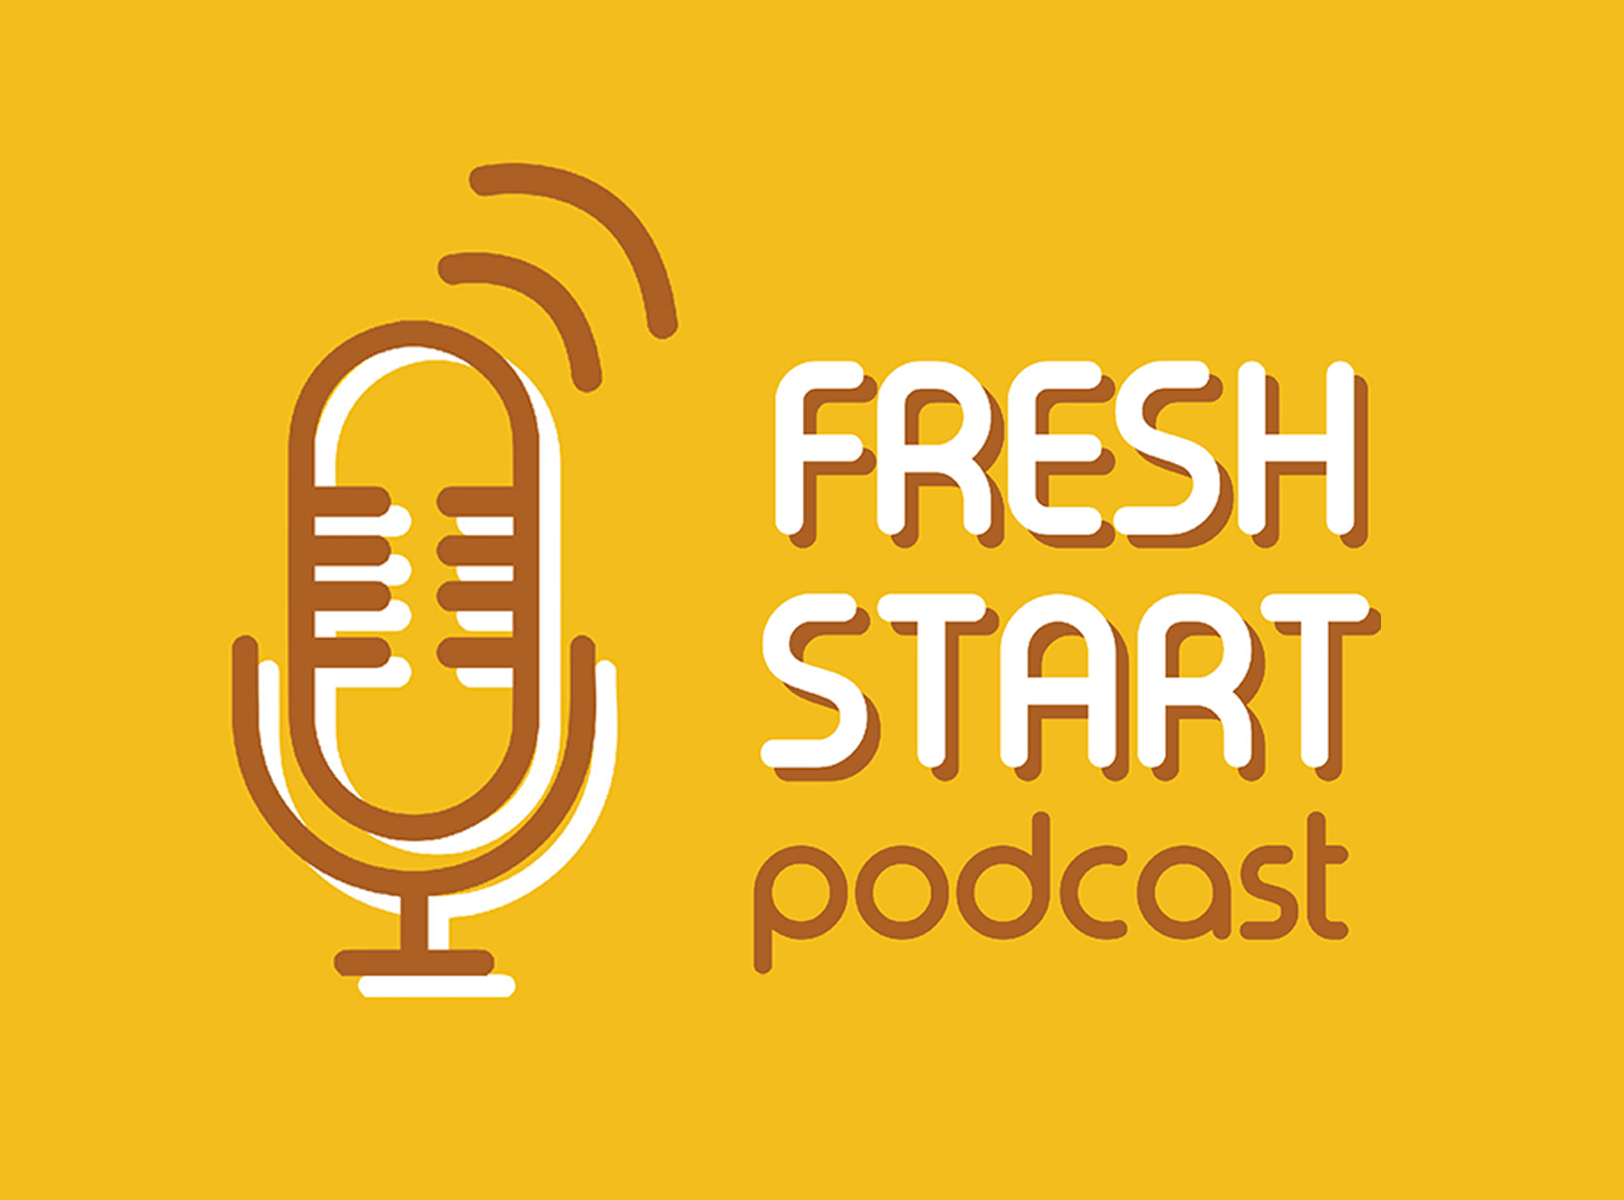 Fresh Start: Podcast News (2/24/2019 Sun.)